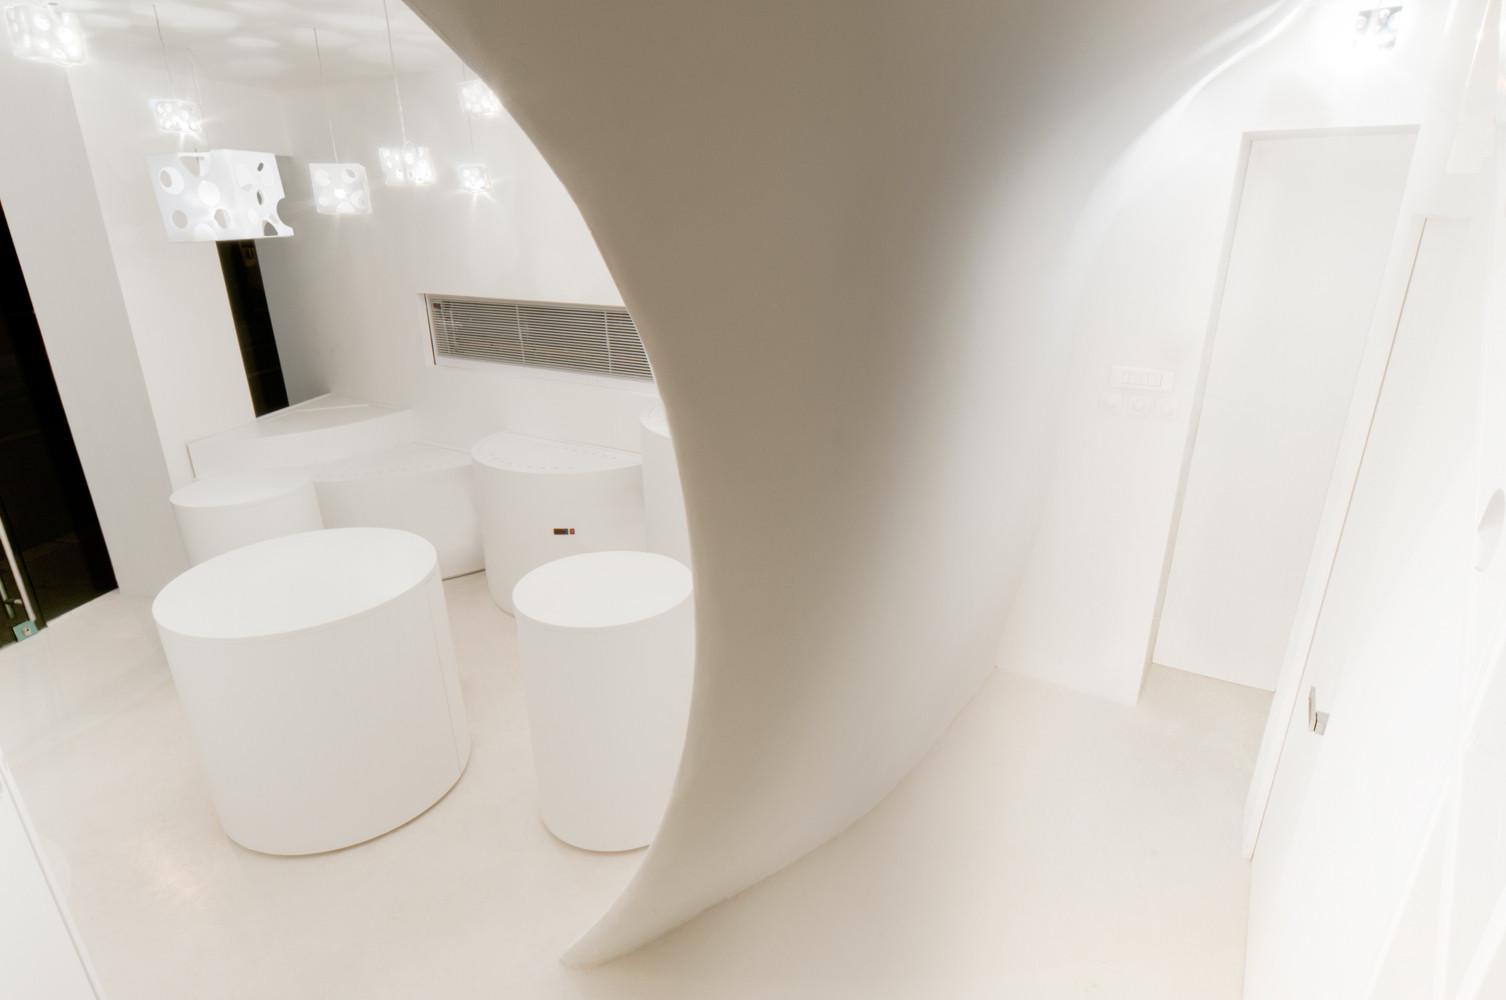 Courtesy of Kotaro Horiuchi Architecture